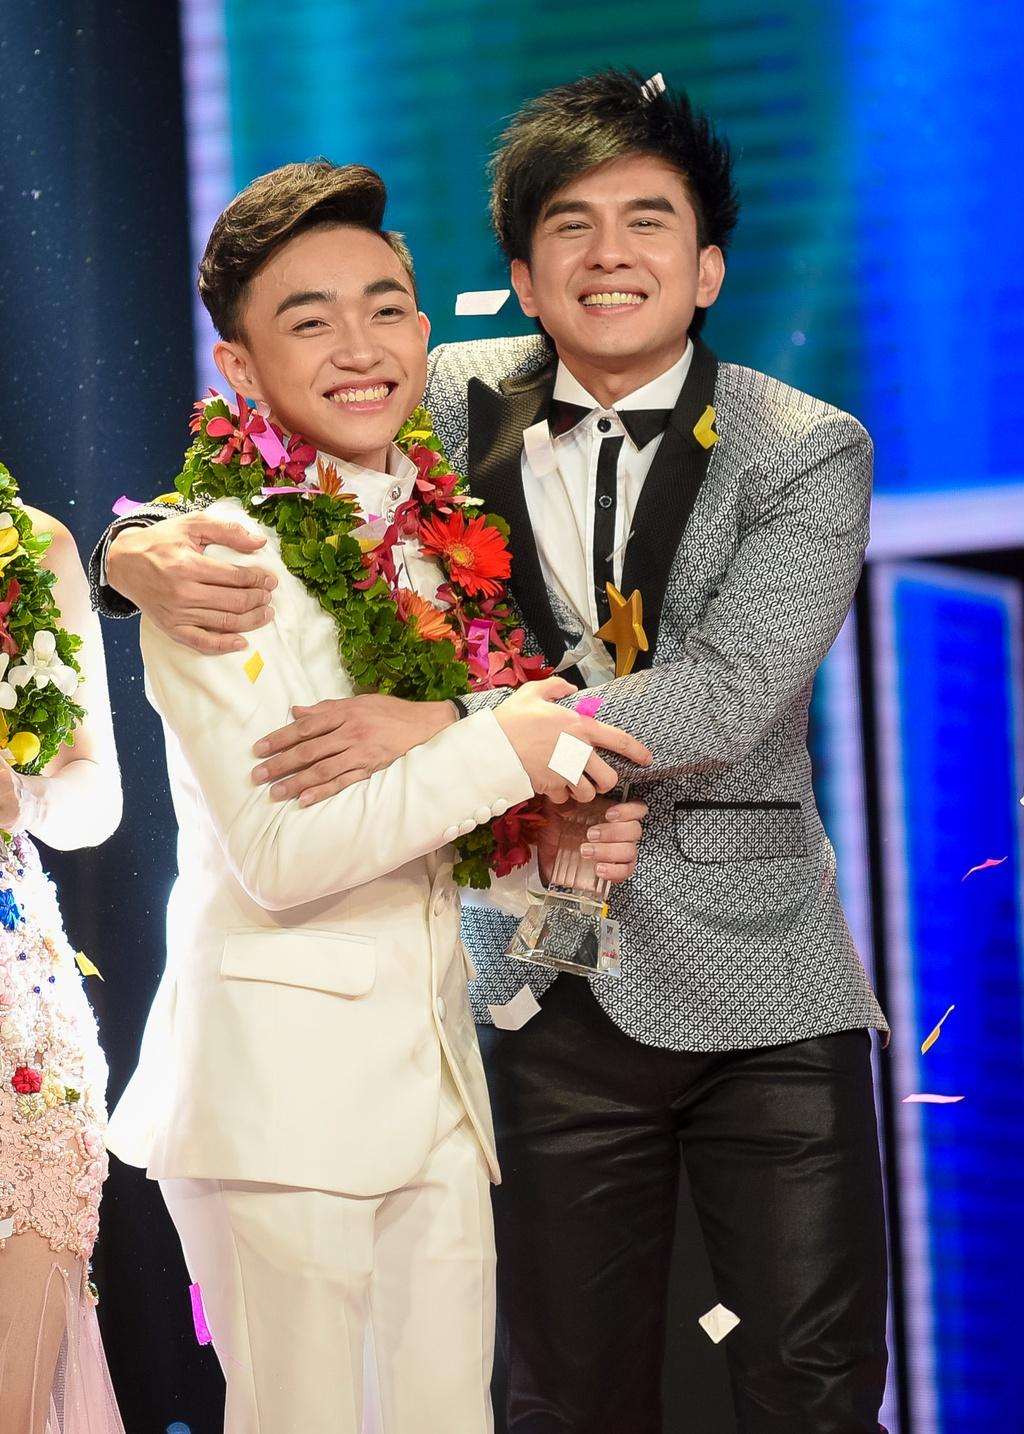 Trung Quang nhan mat khi Dan Truong hon luc dang quang hinh anh 1